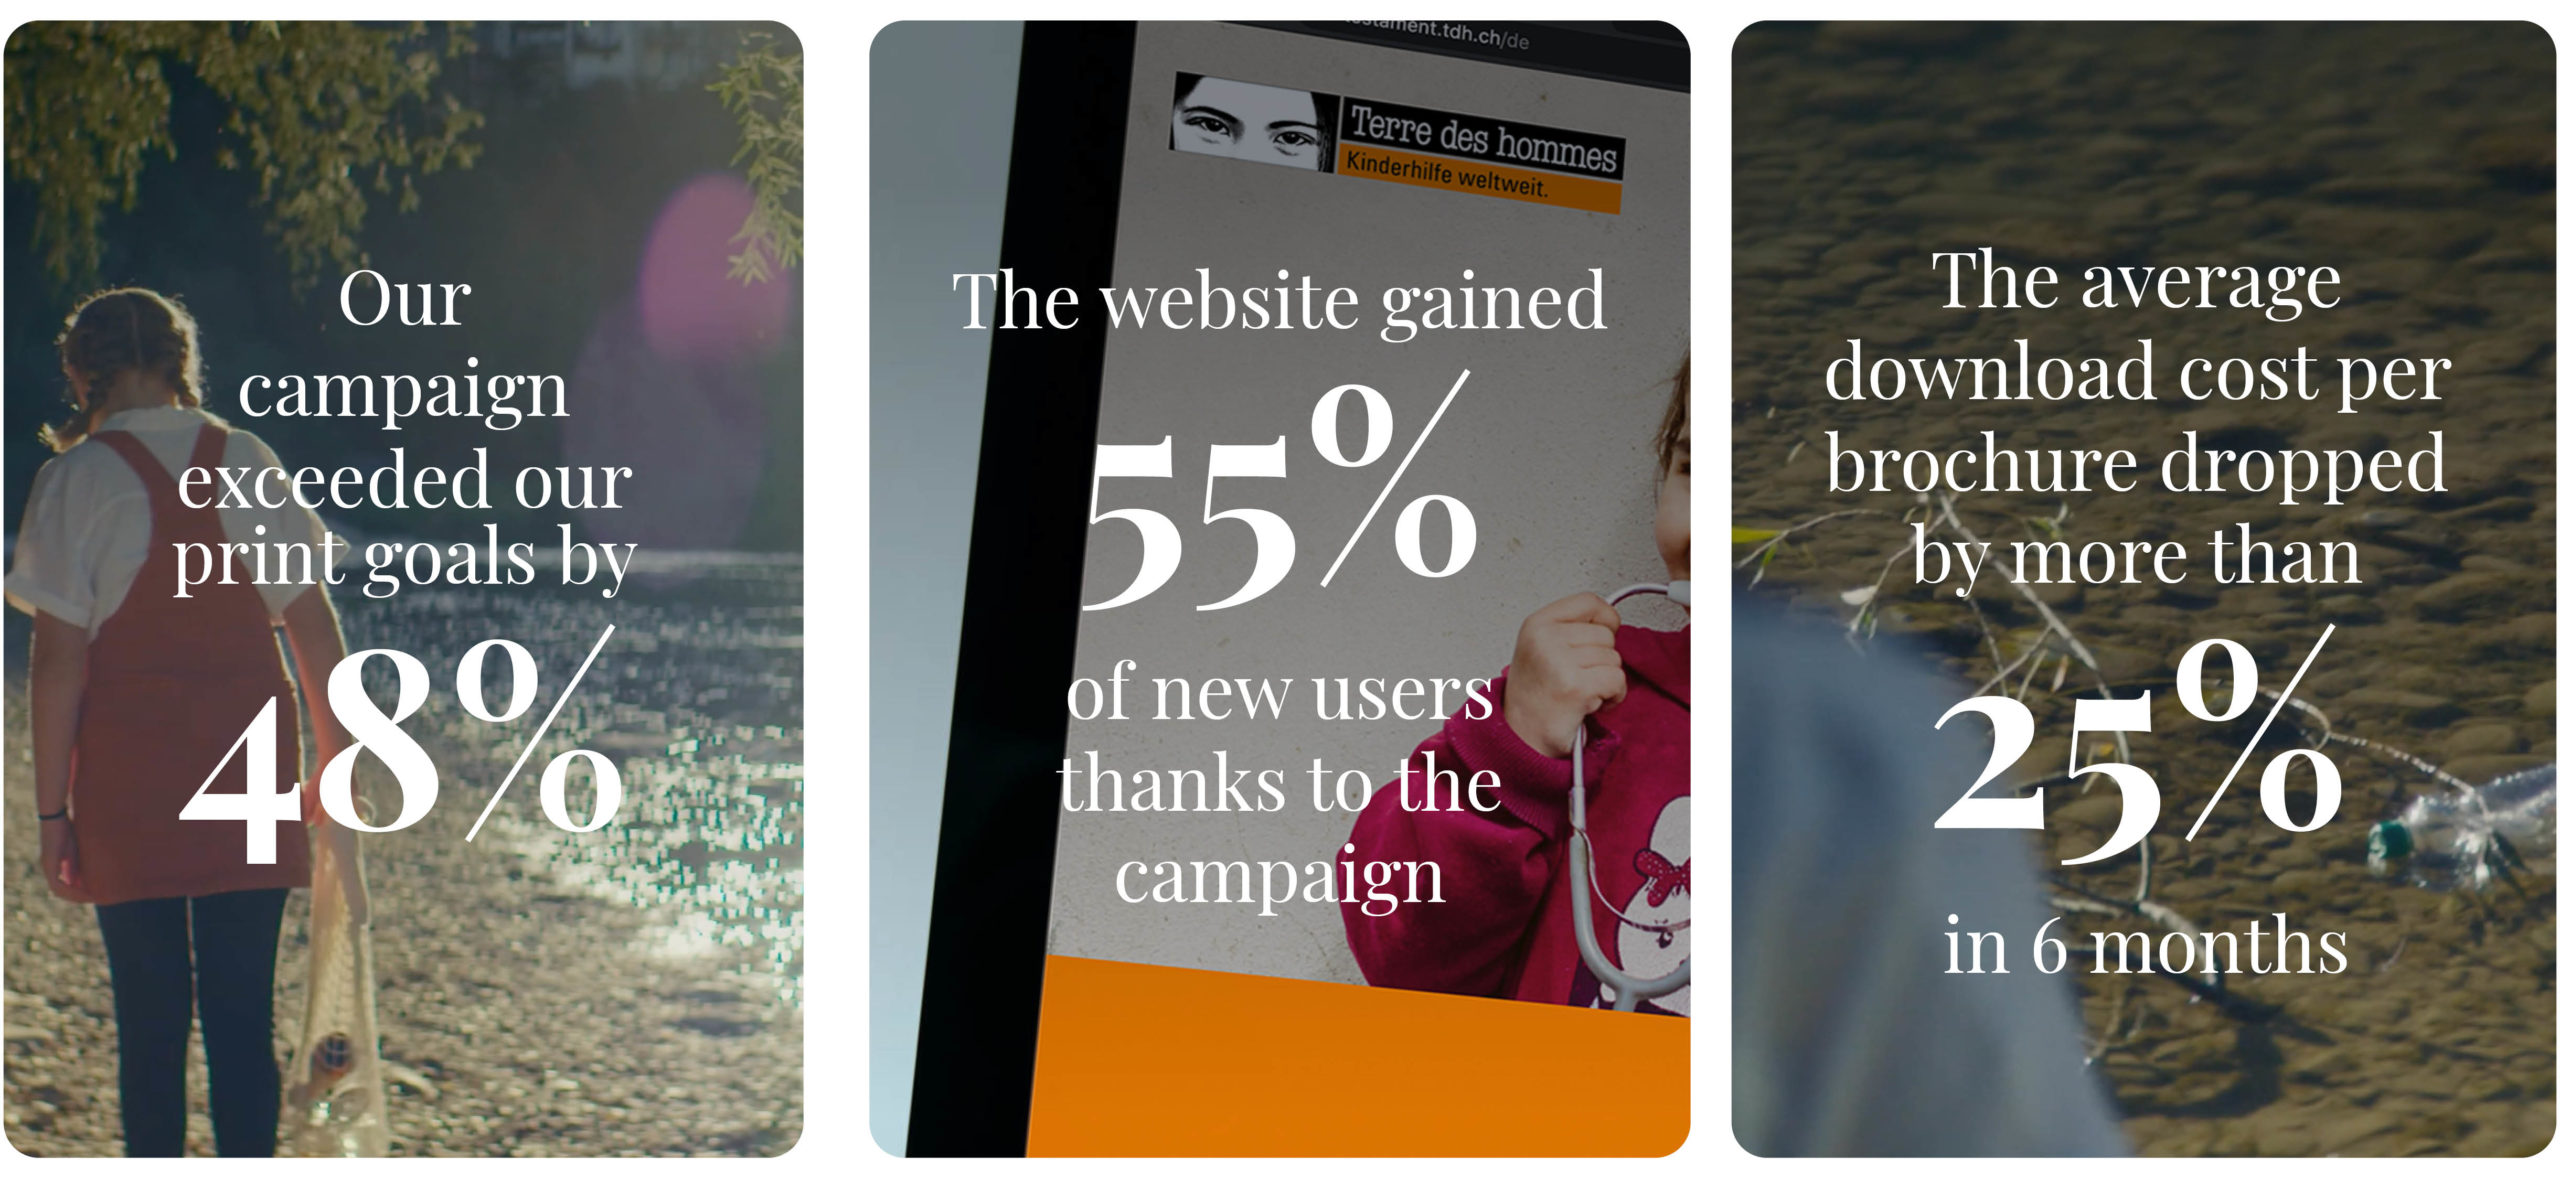 tdh case enigma campaign9 impact EN scaled